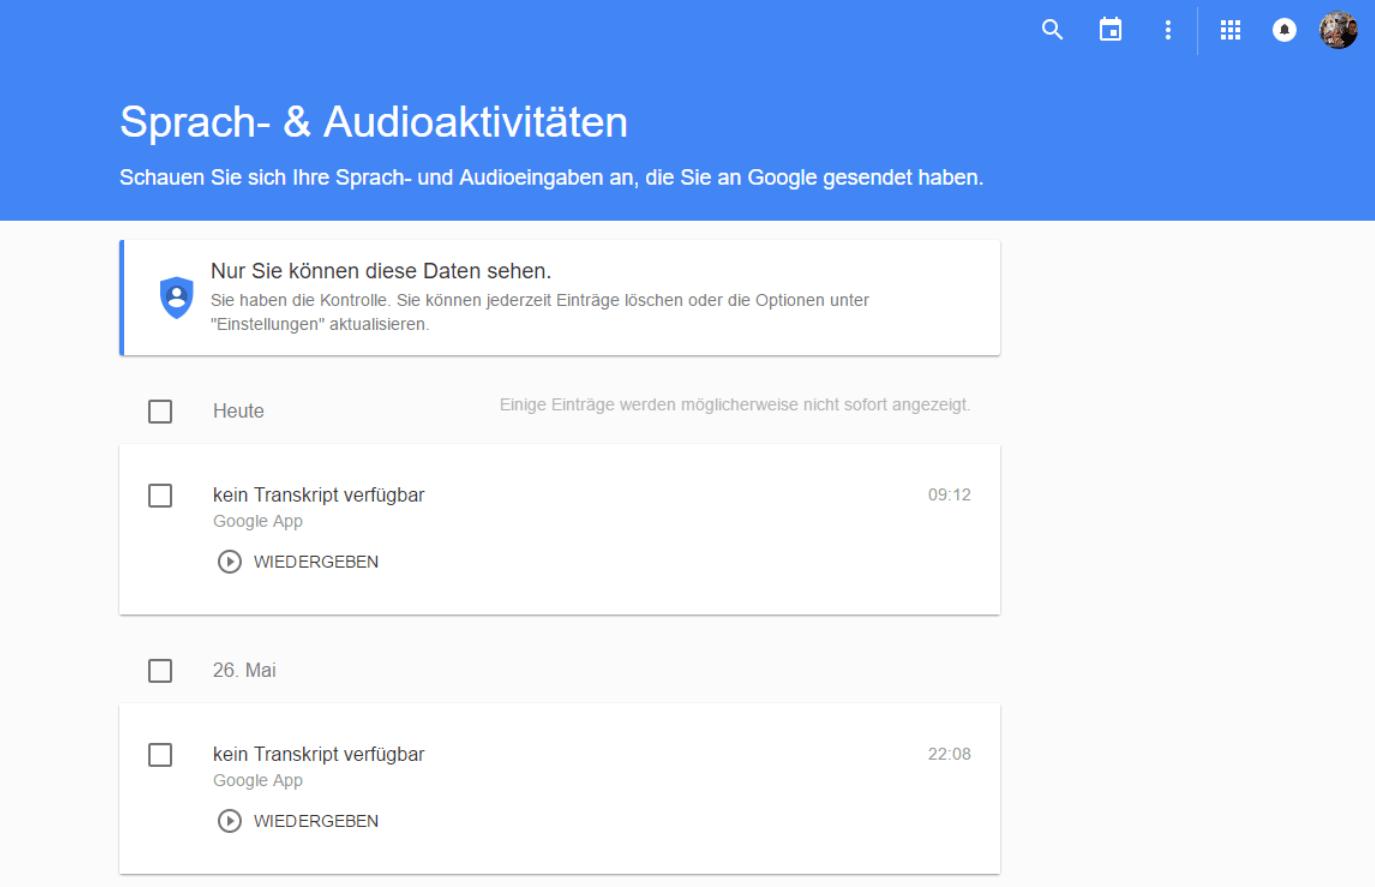 google history audio